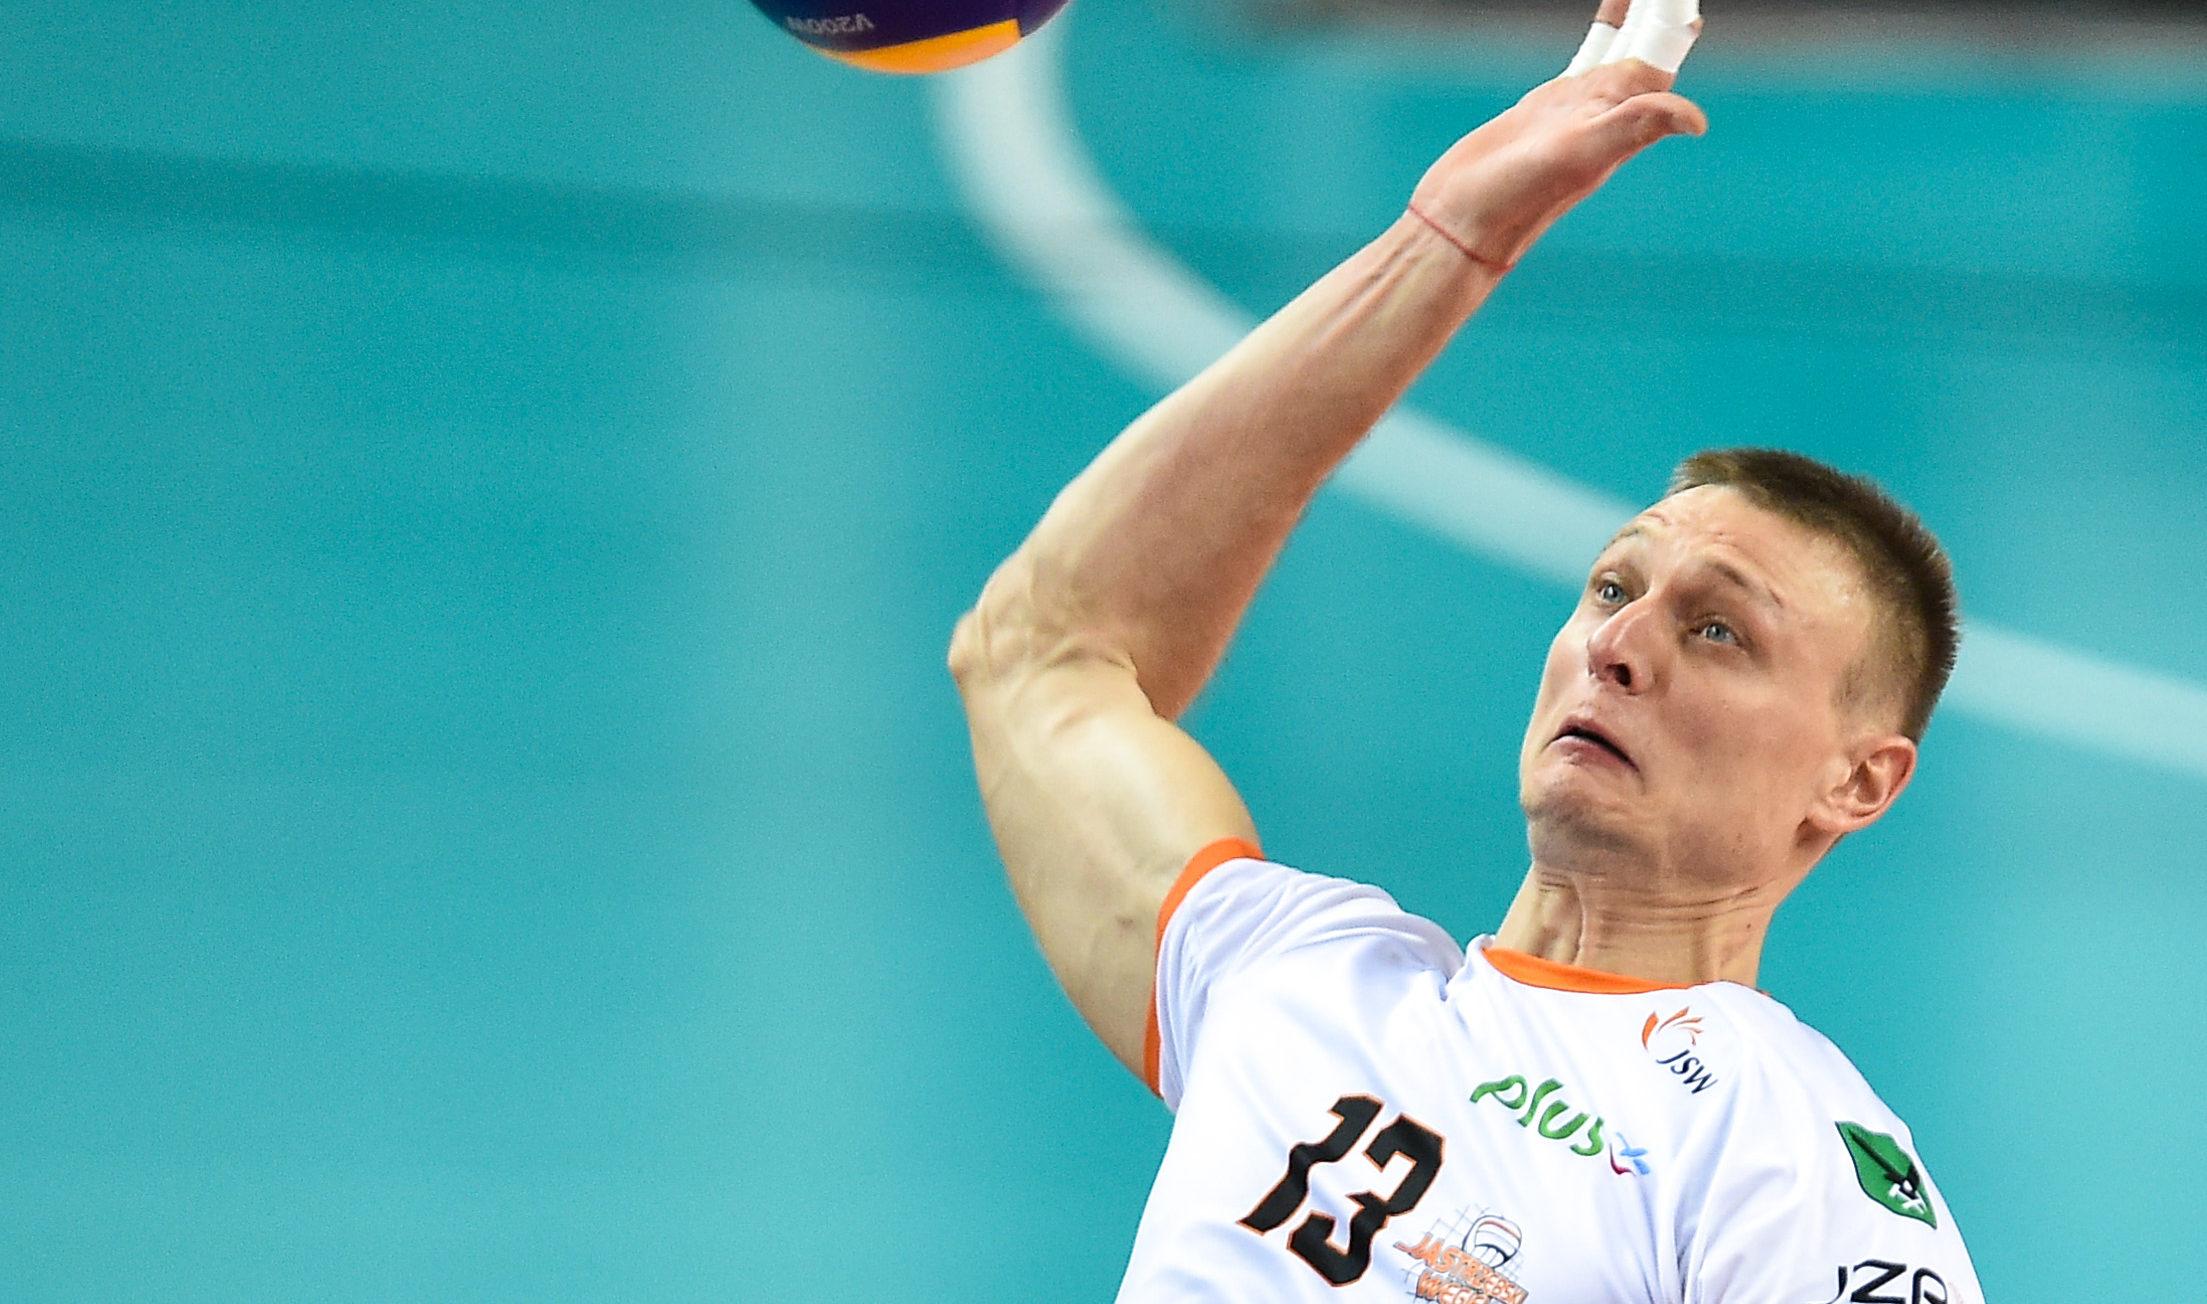 Jurij Gładyr